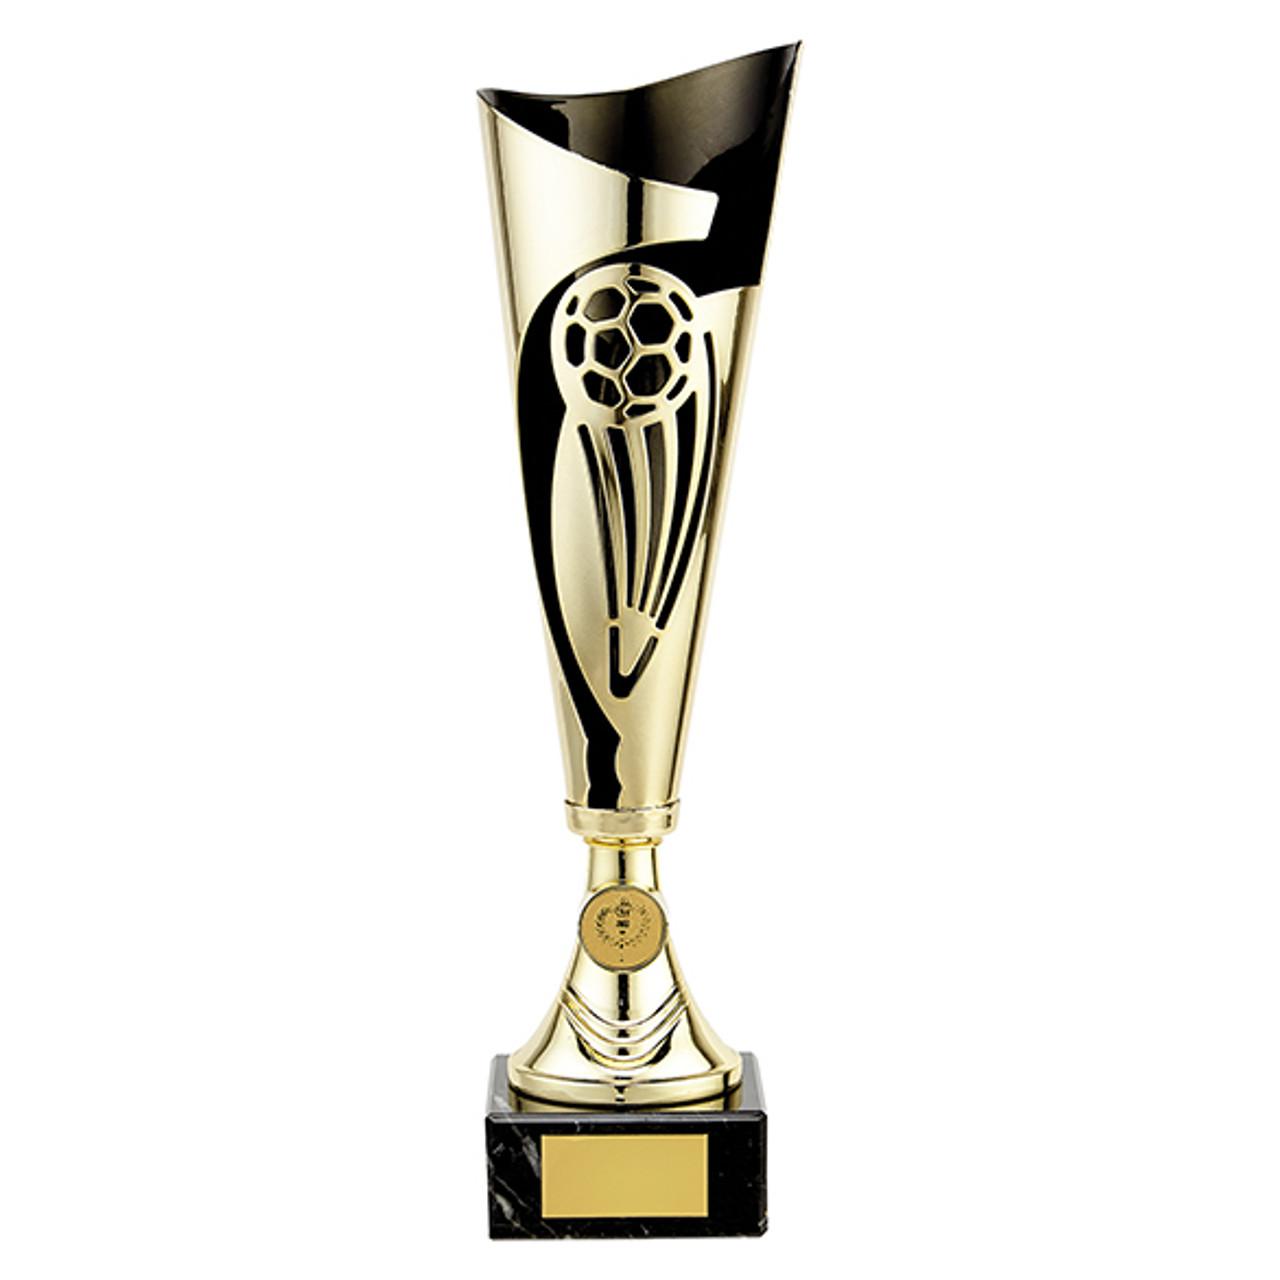 Gold Silver Cone Trophy Award Winner Football Dancing Equestrian FREE Engraving